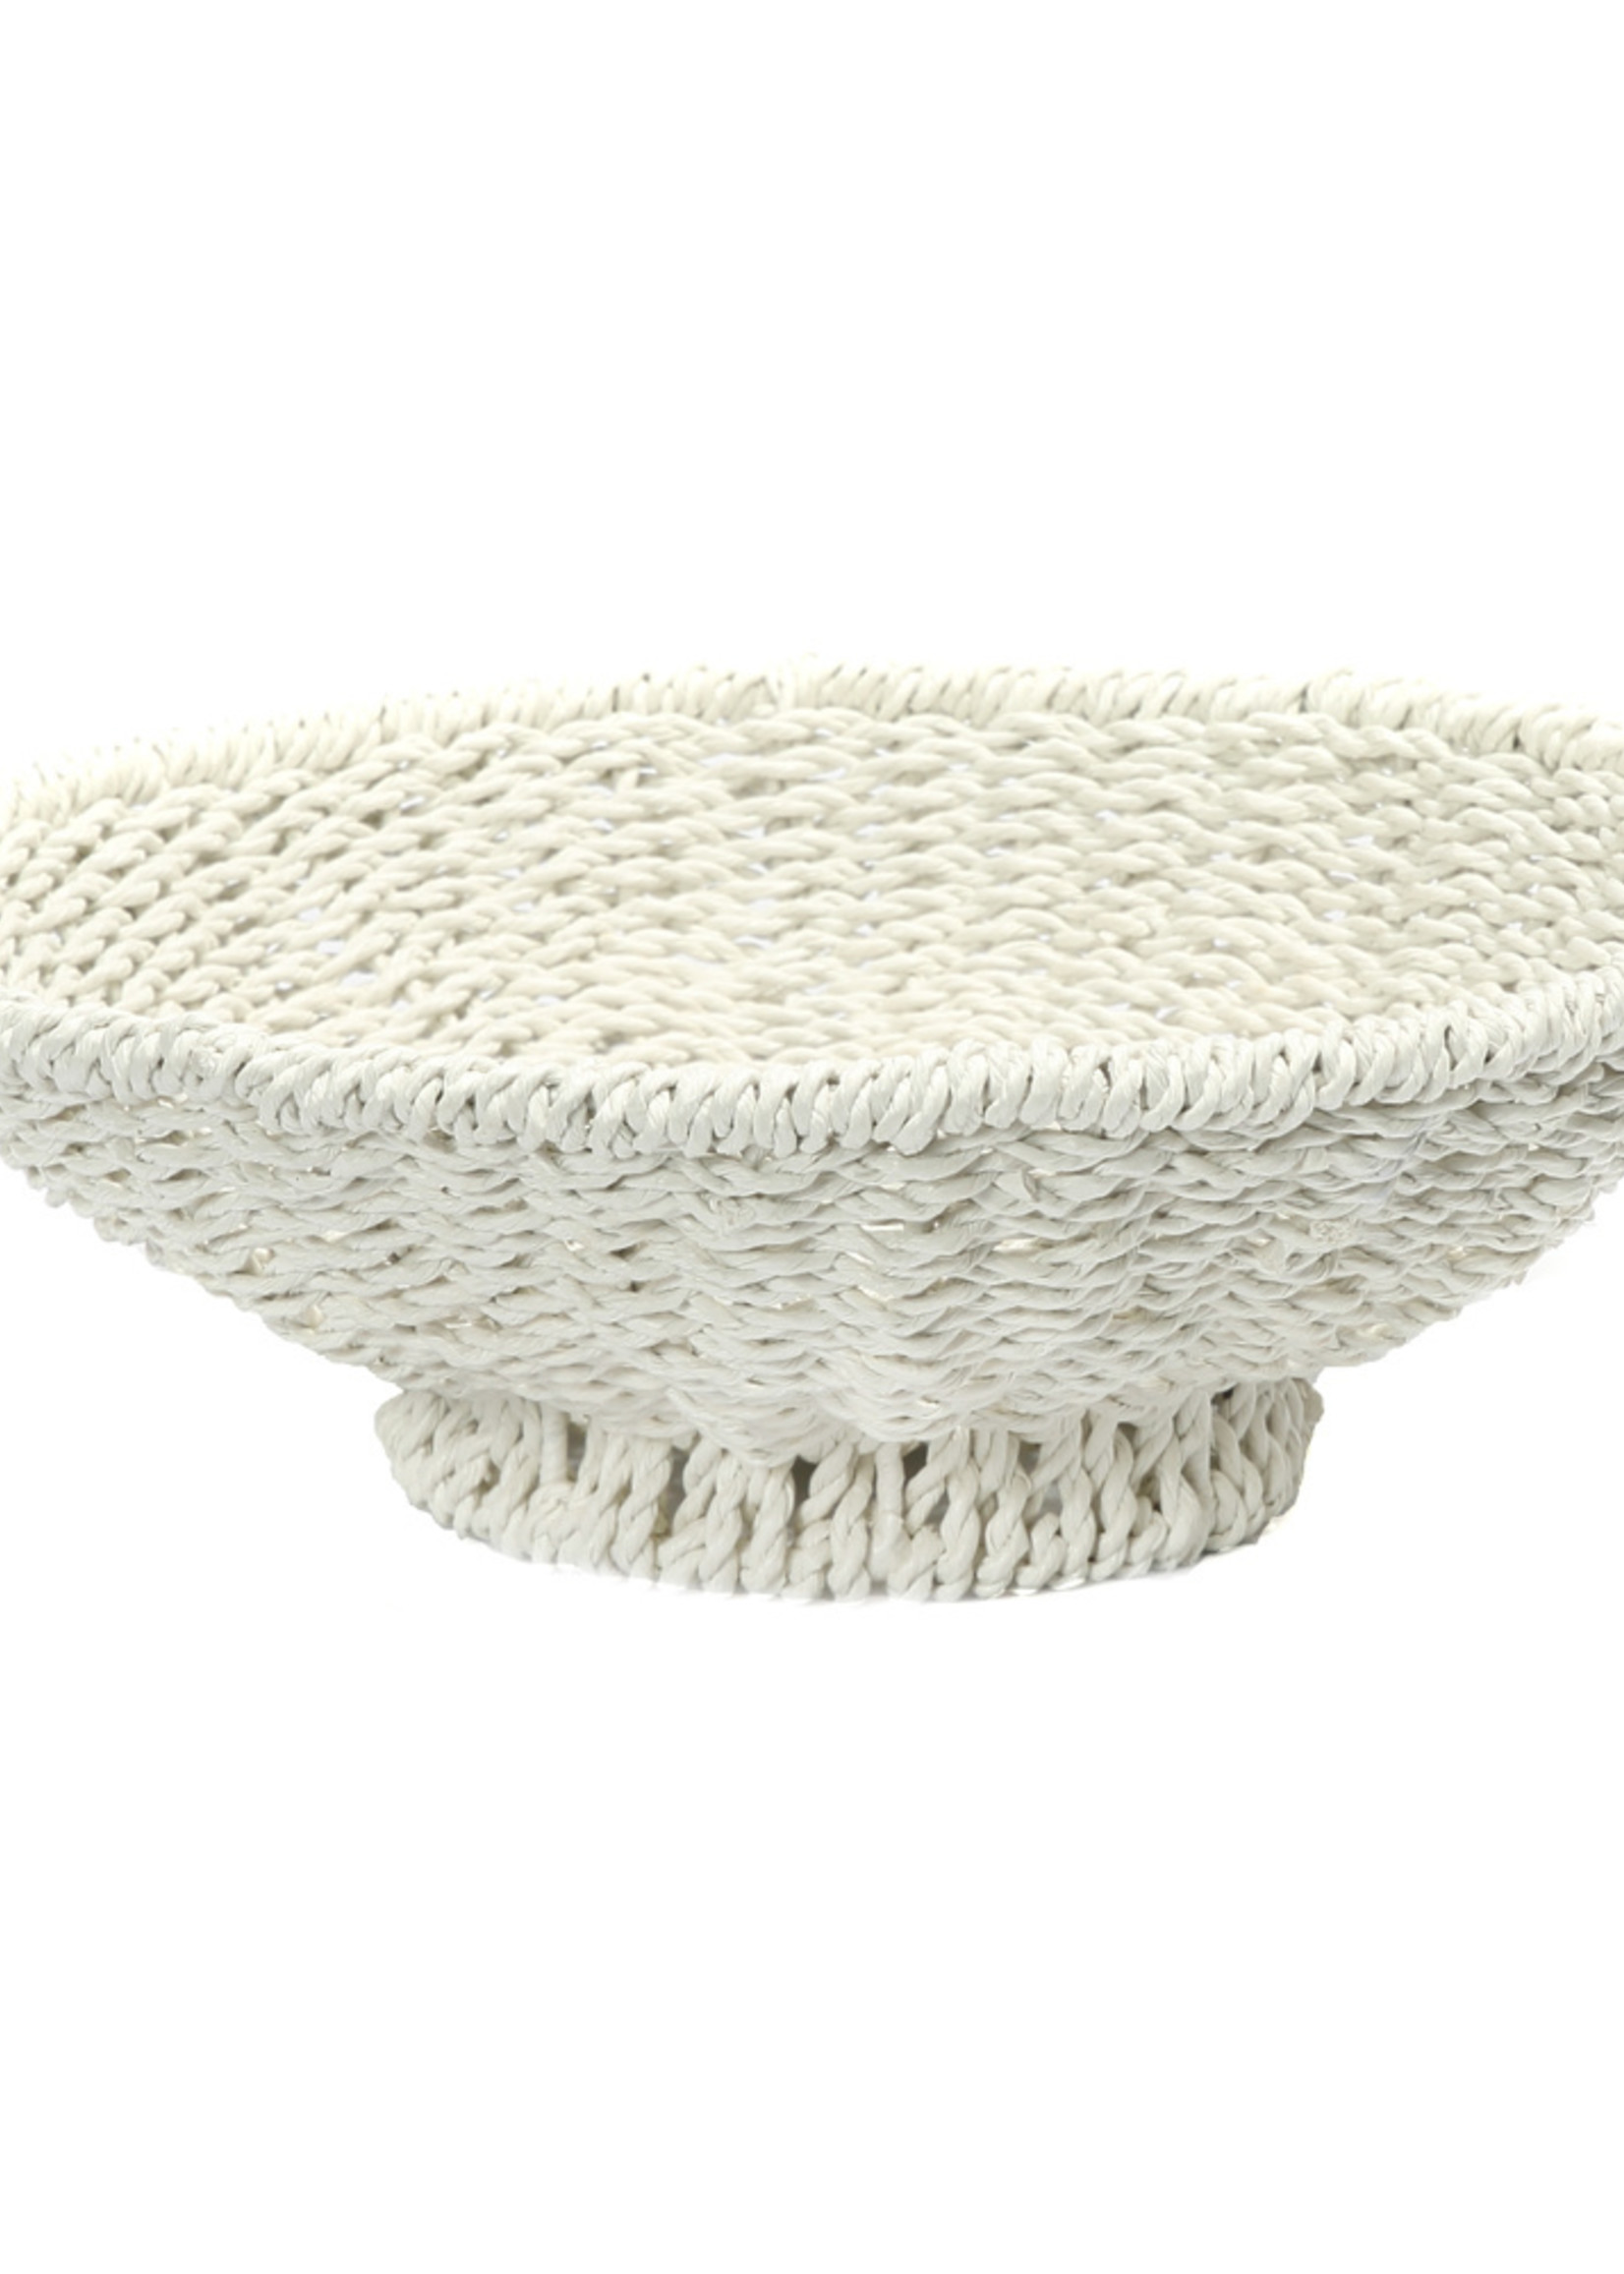 The Porto Seagrass Bowl - White